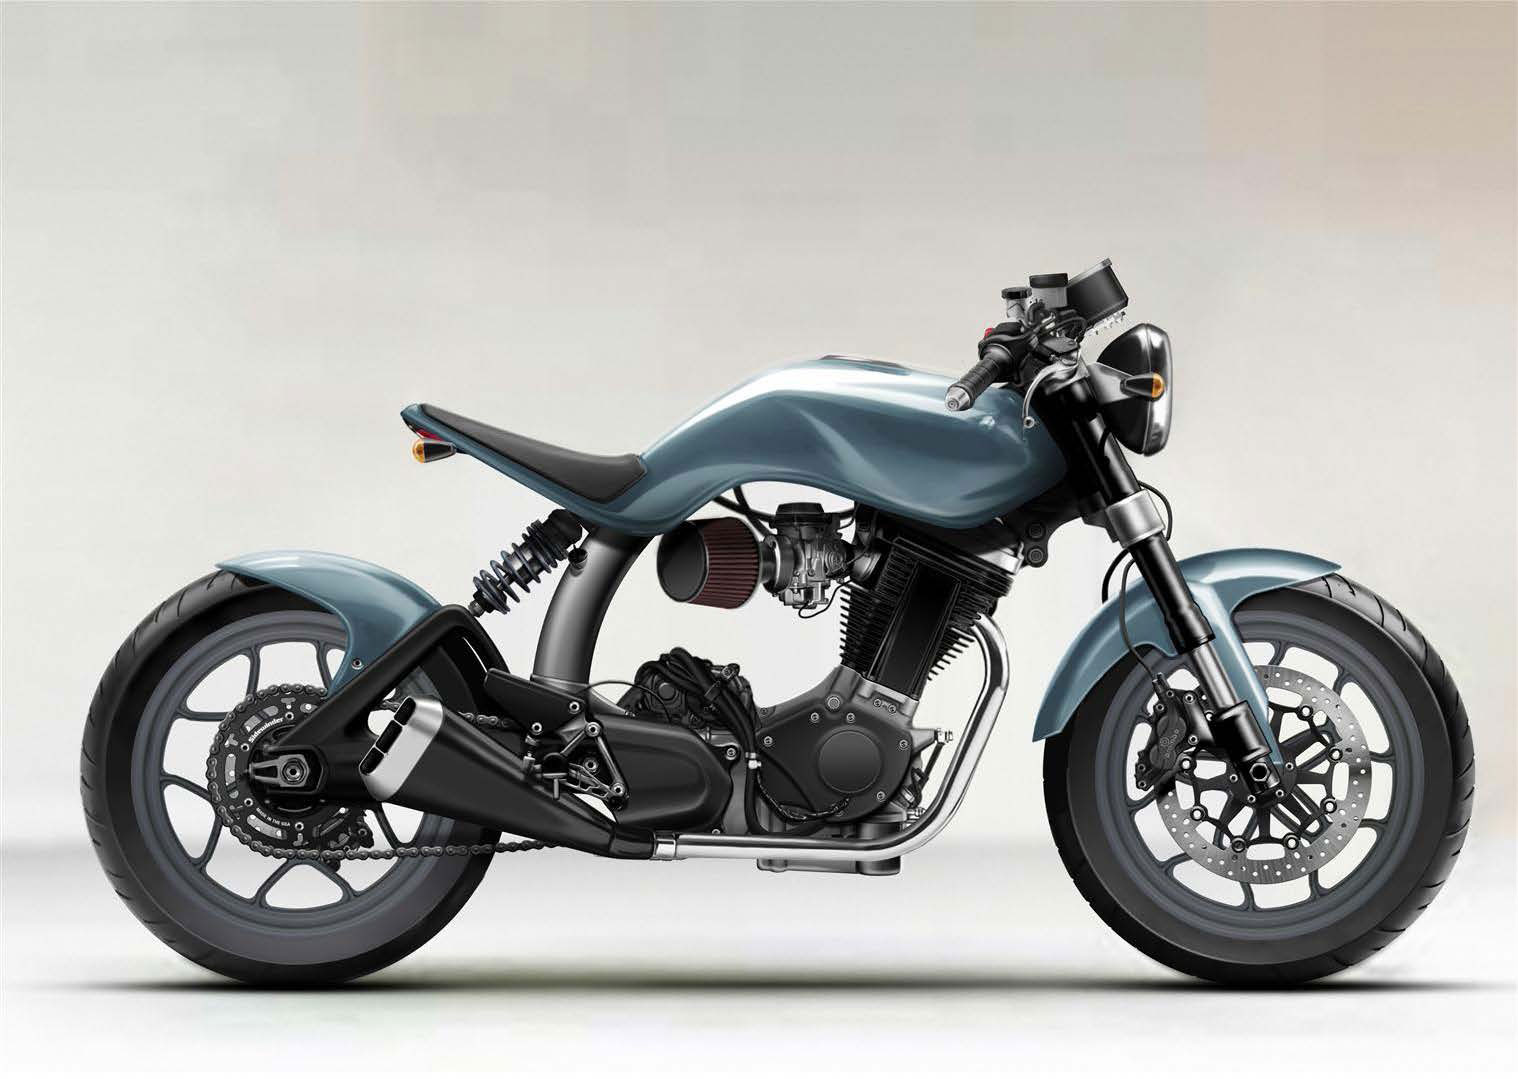 Artist impression of a Mac motorcycles Ellis Pitt's Ruby single cylinder custom